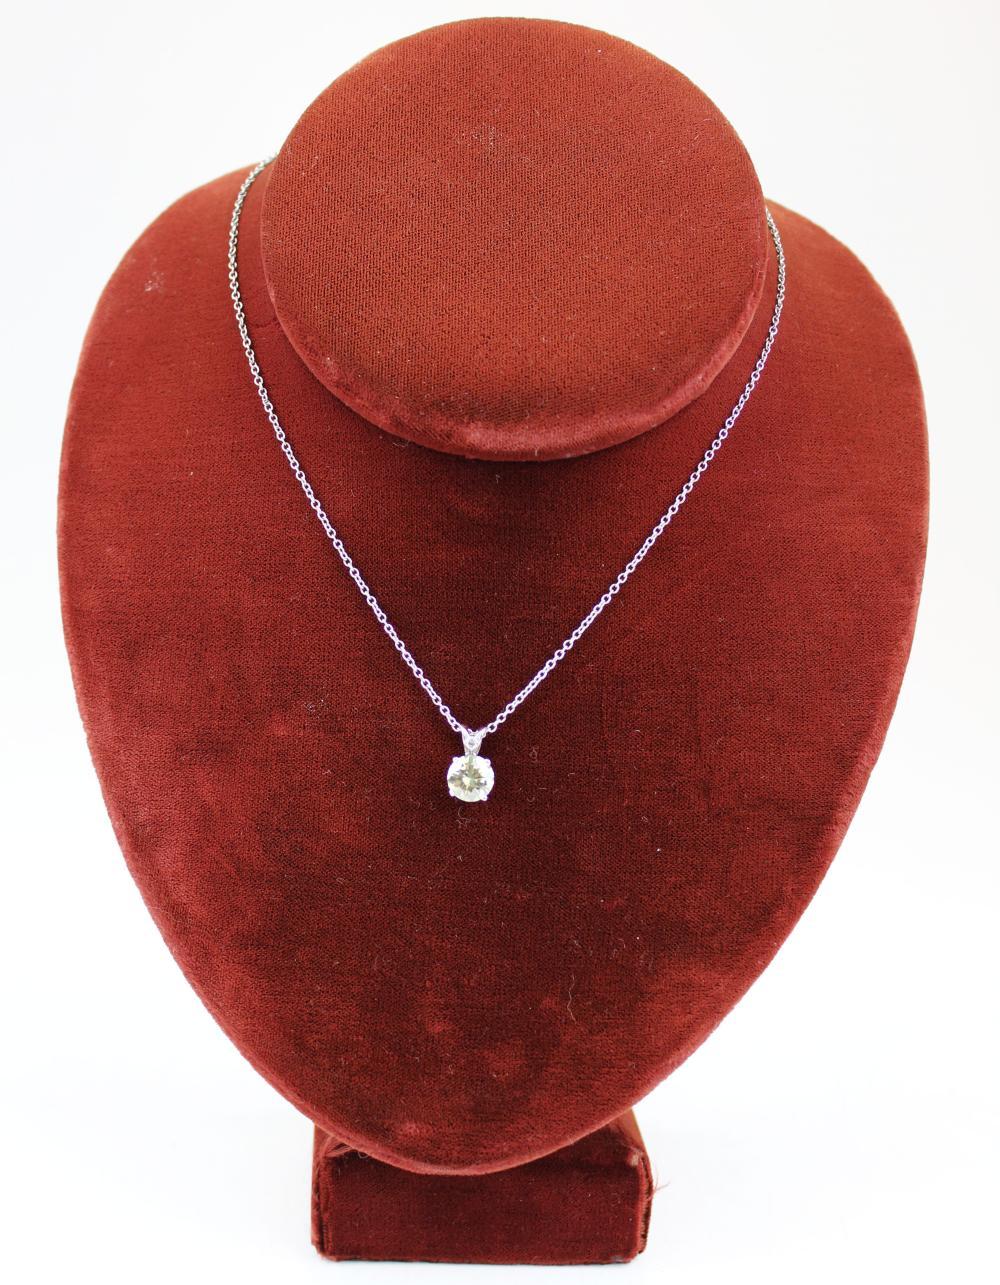 2.19 ct diamond pendant